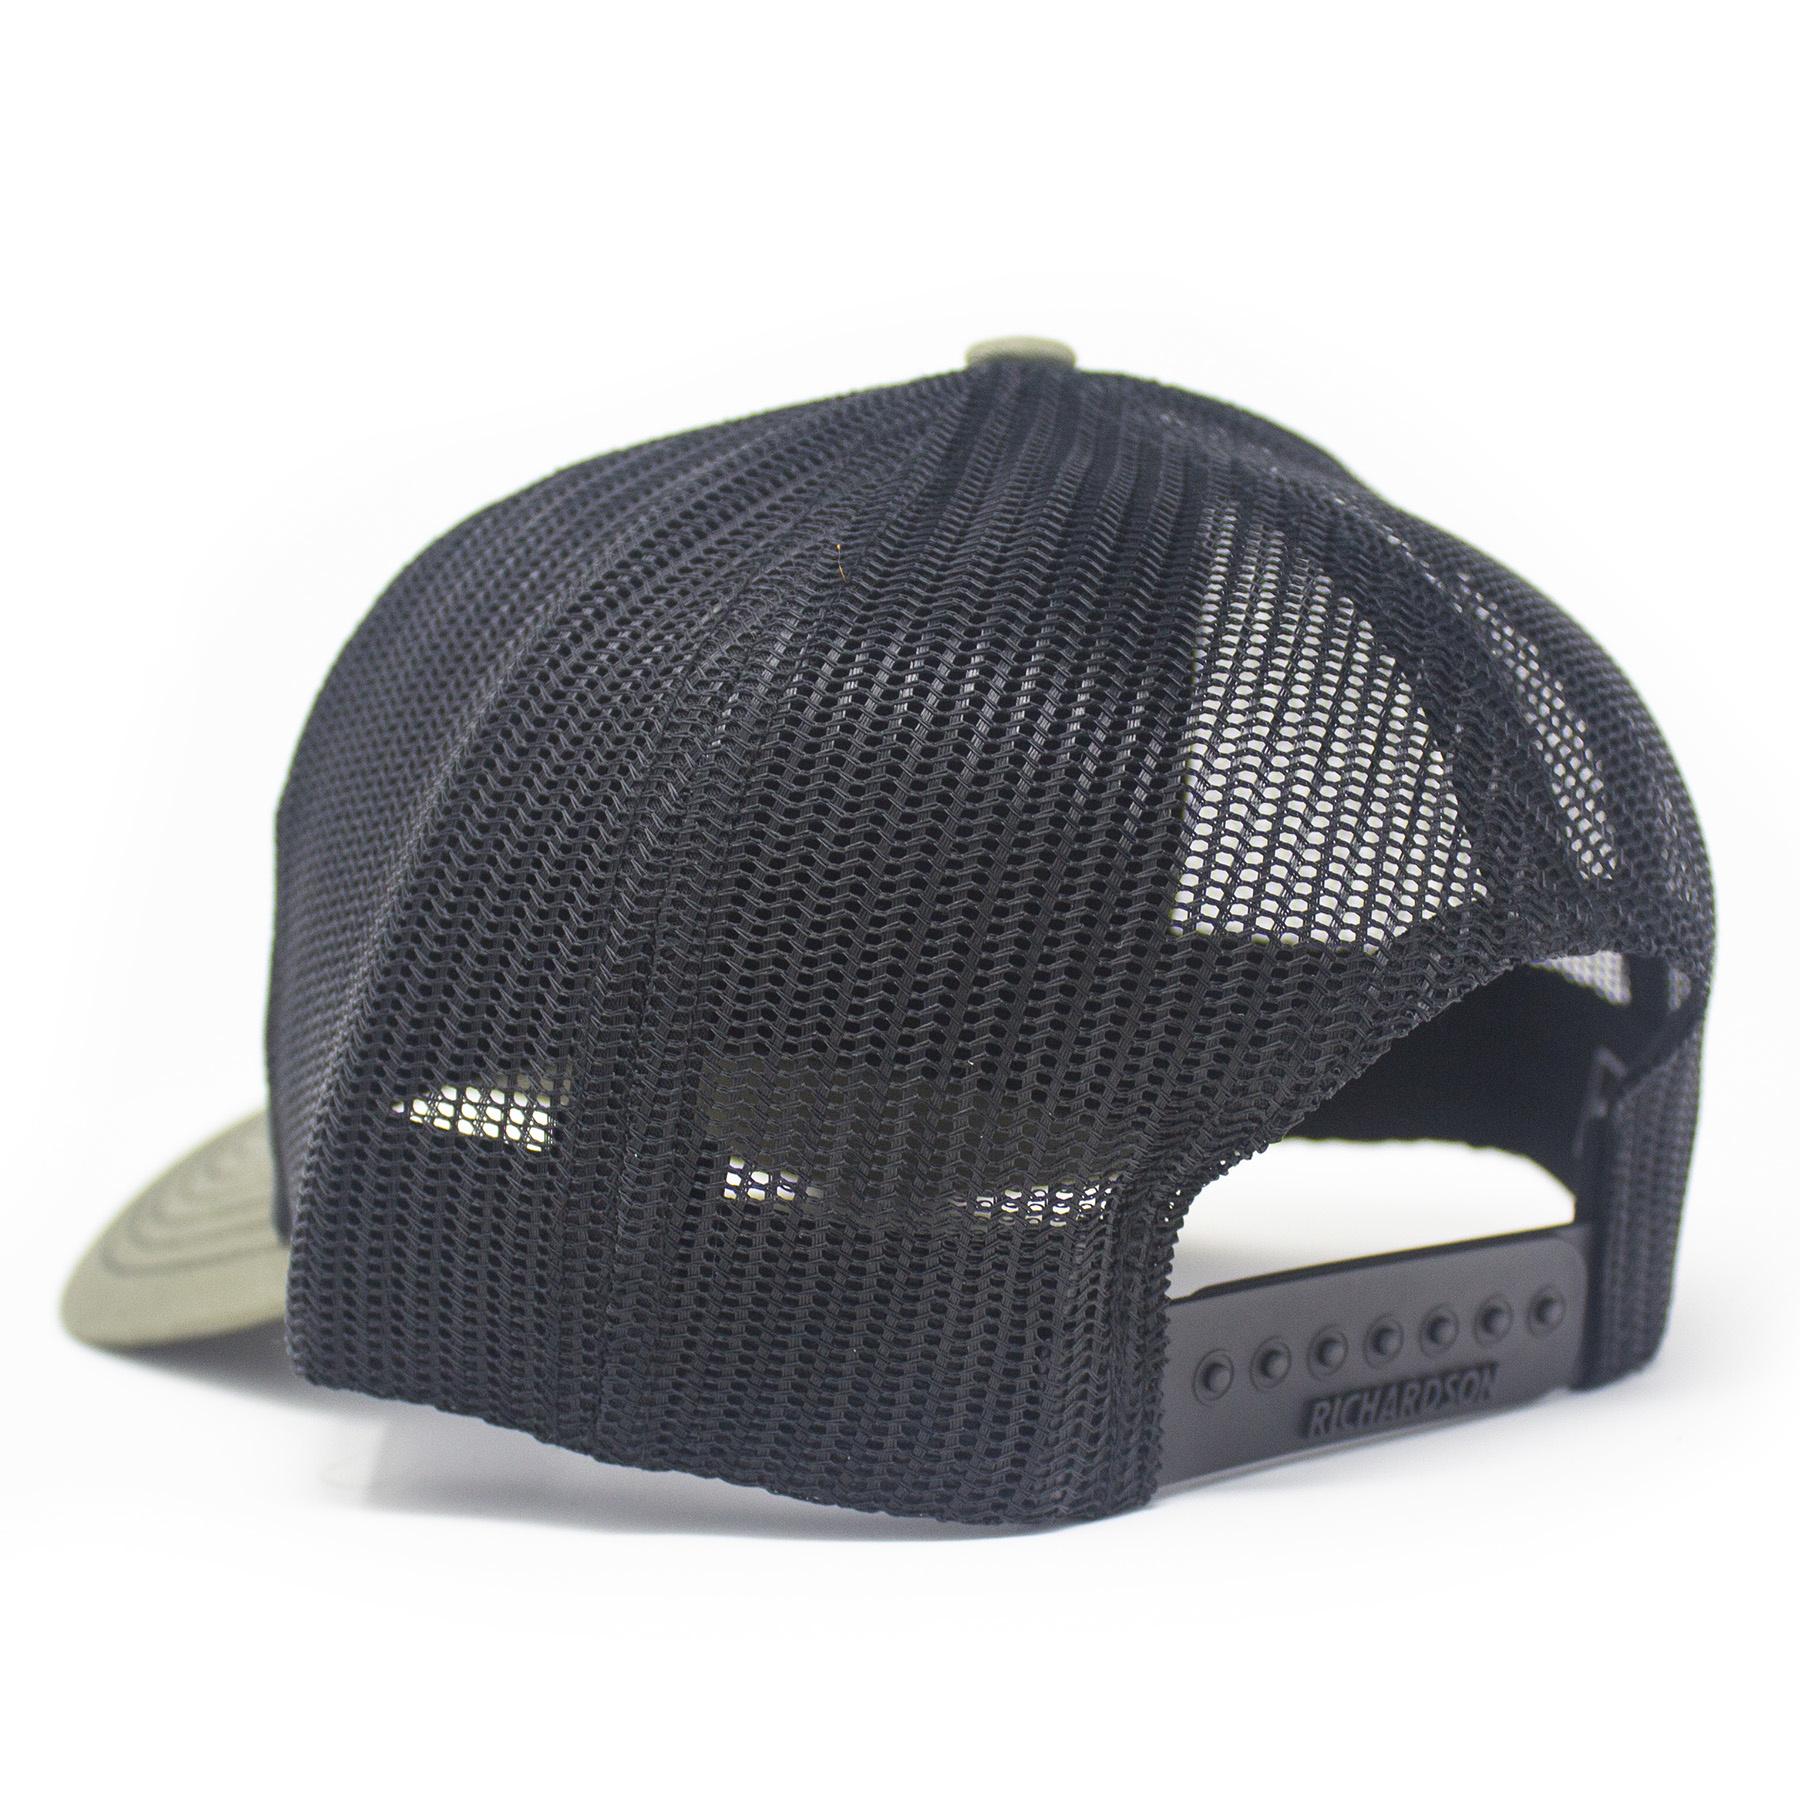 Arizona State Flag Trucker Hat, Black-2